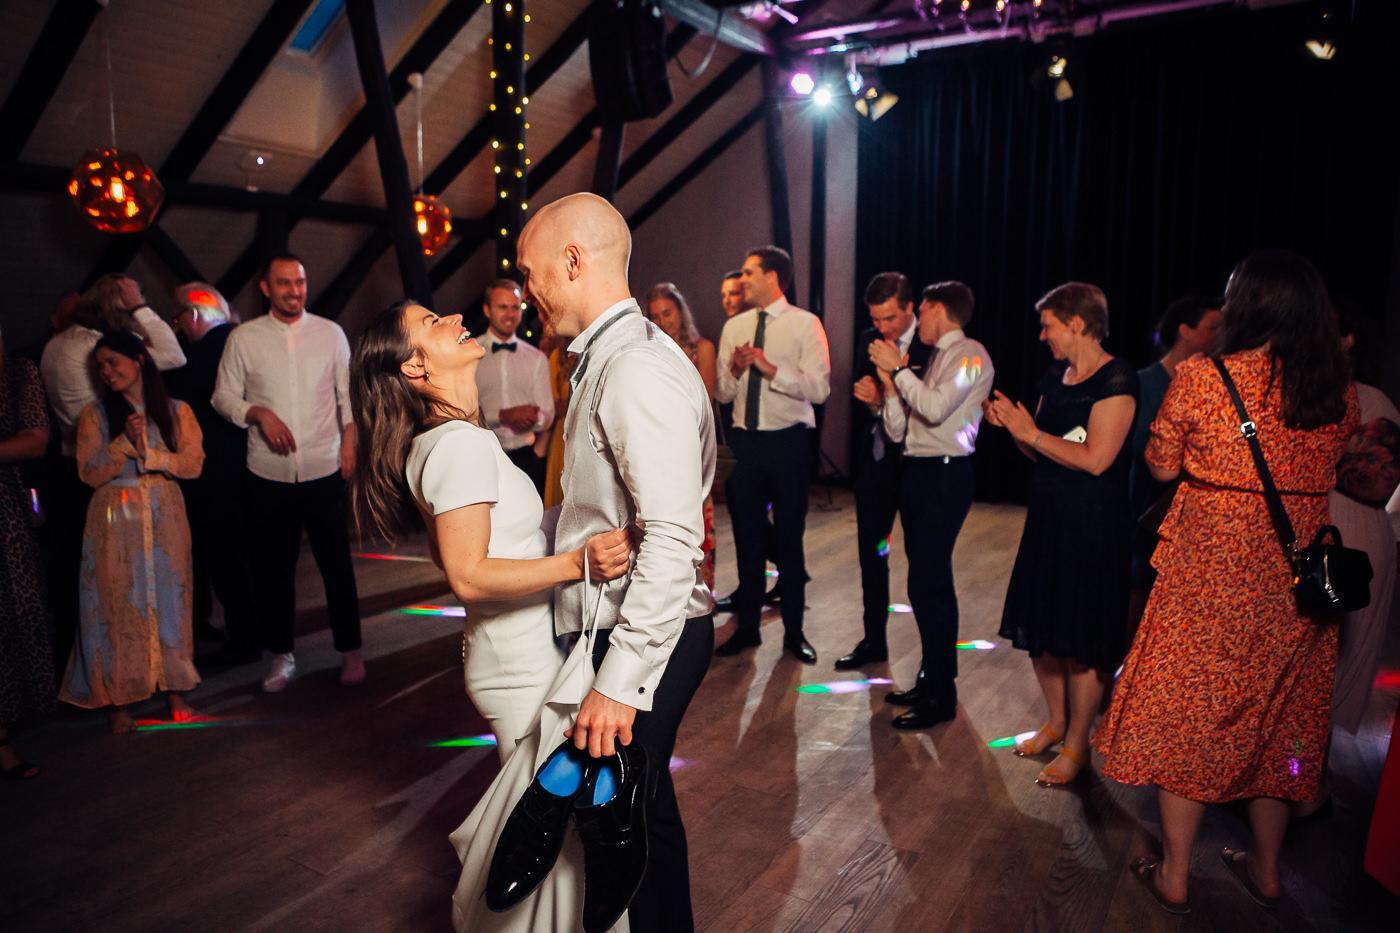 Malene & Ole Martin - elegant dansk- norskt bryllup i Oslo Bryllup Gamle Aker Oslo 7 Akershus